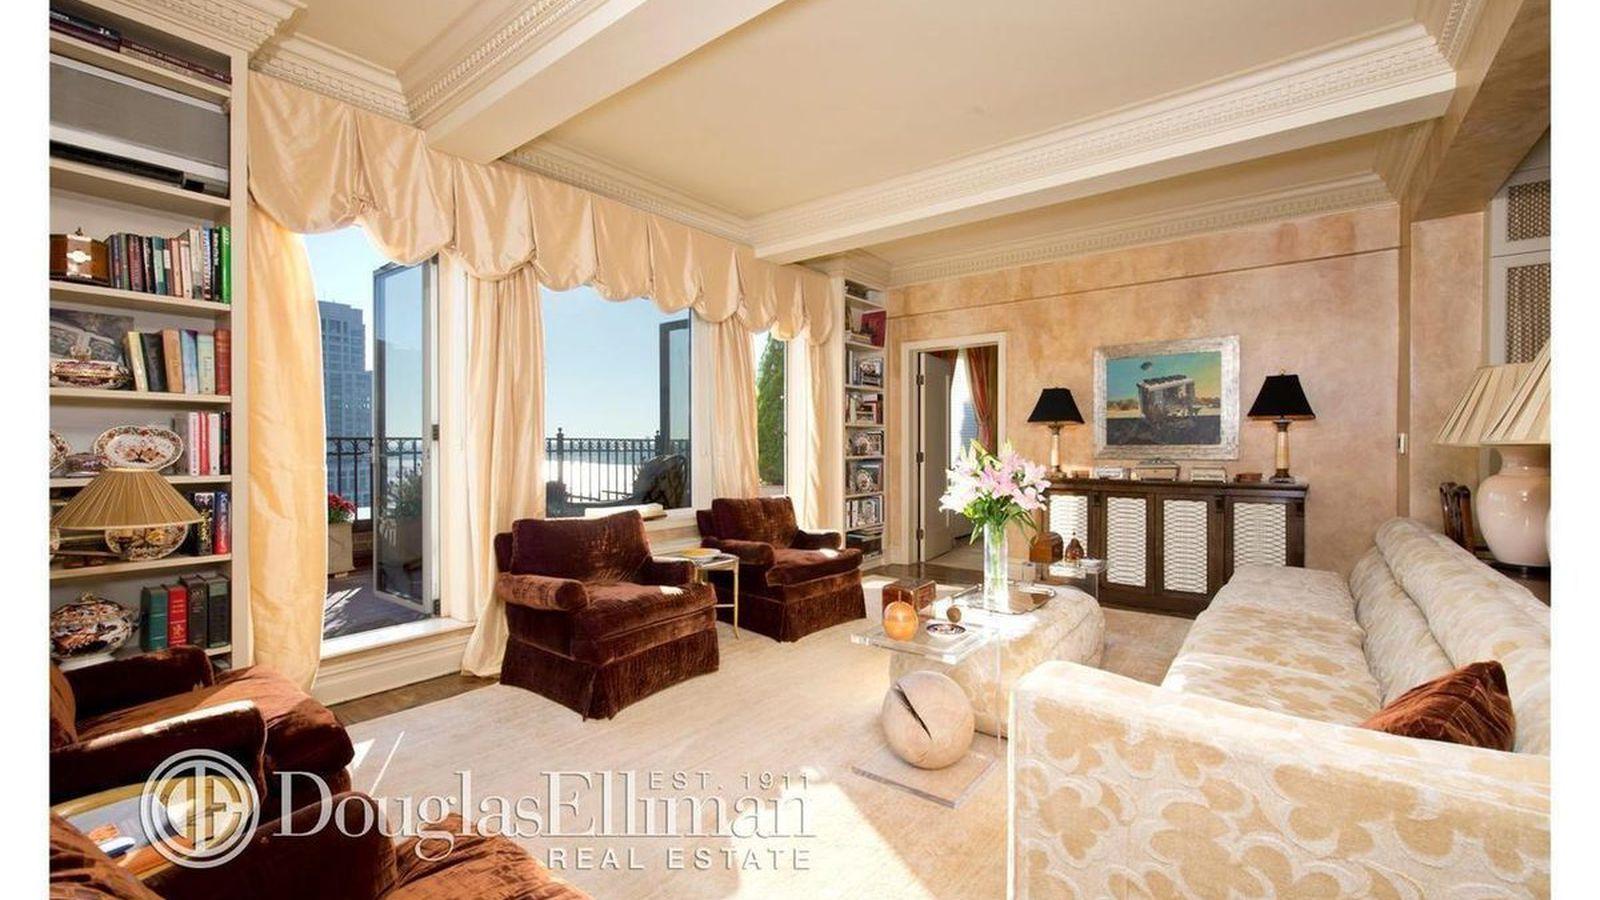 Ira gershwin 39 s uws penthouse with huge terrace seeks 6m for 45 upper terrace san francisco